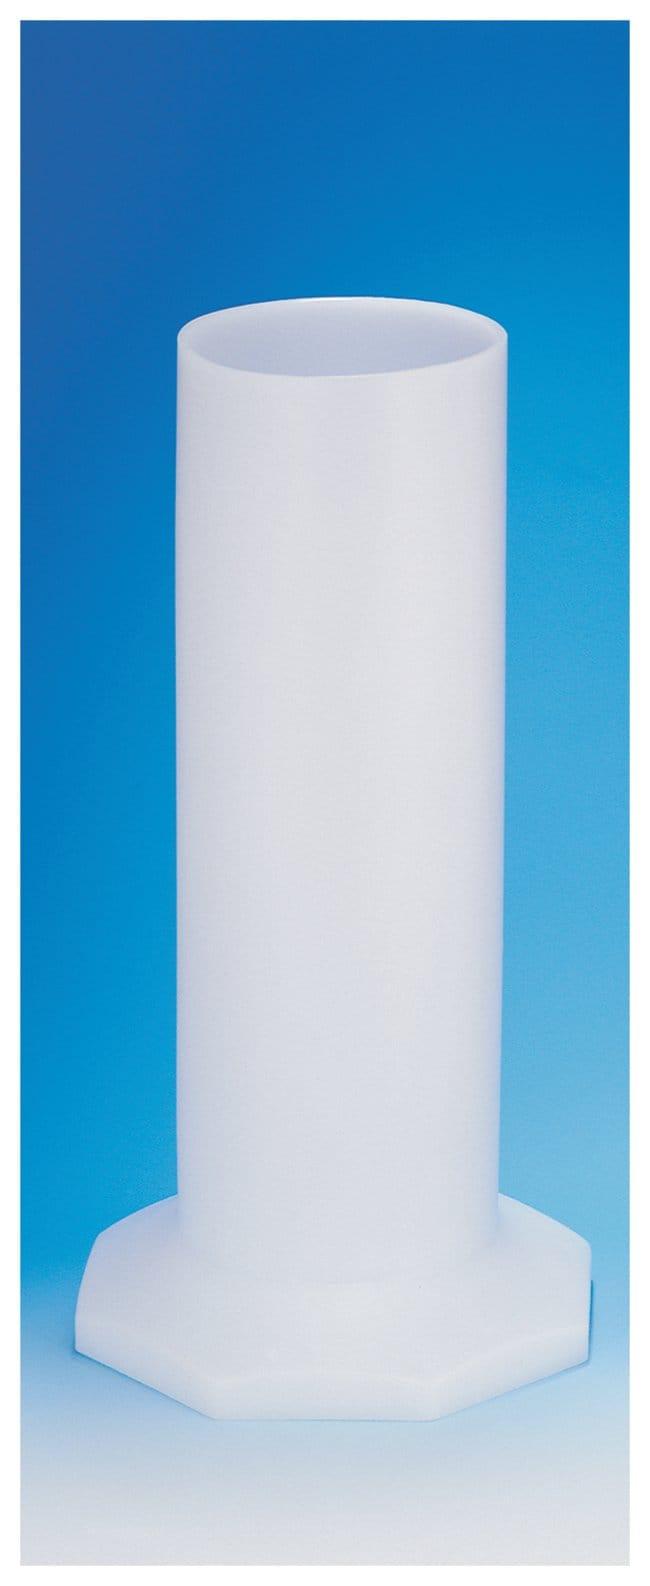 FisherbrandPipet Jar Dia. x H: 6 x 24 in.:Pipettes